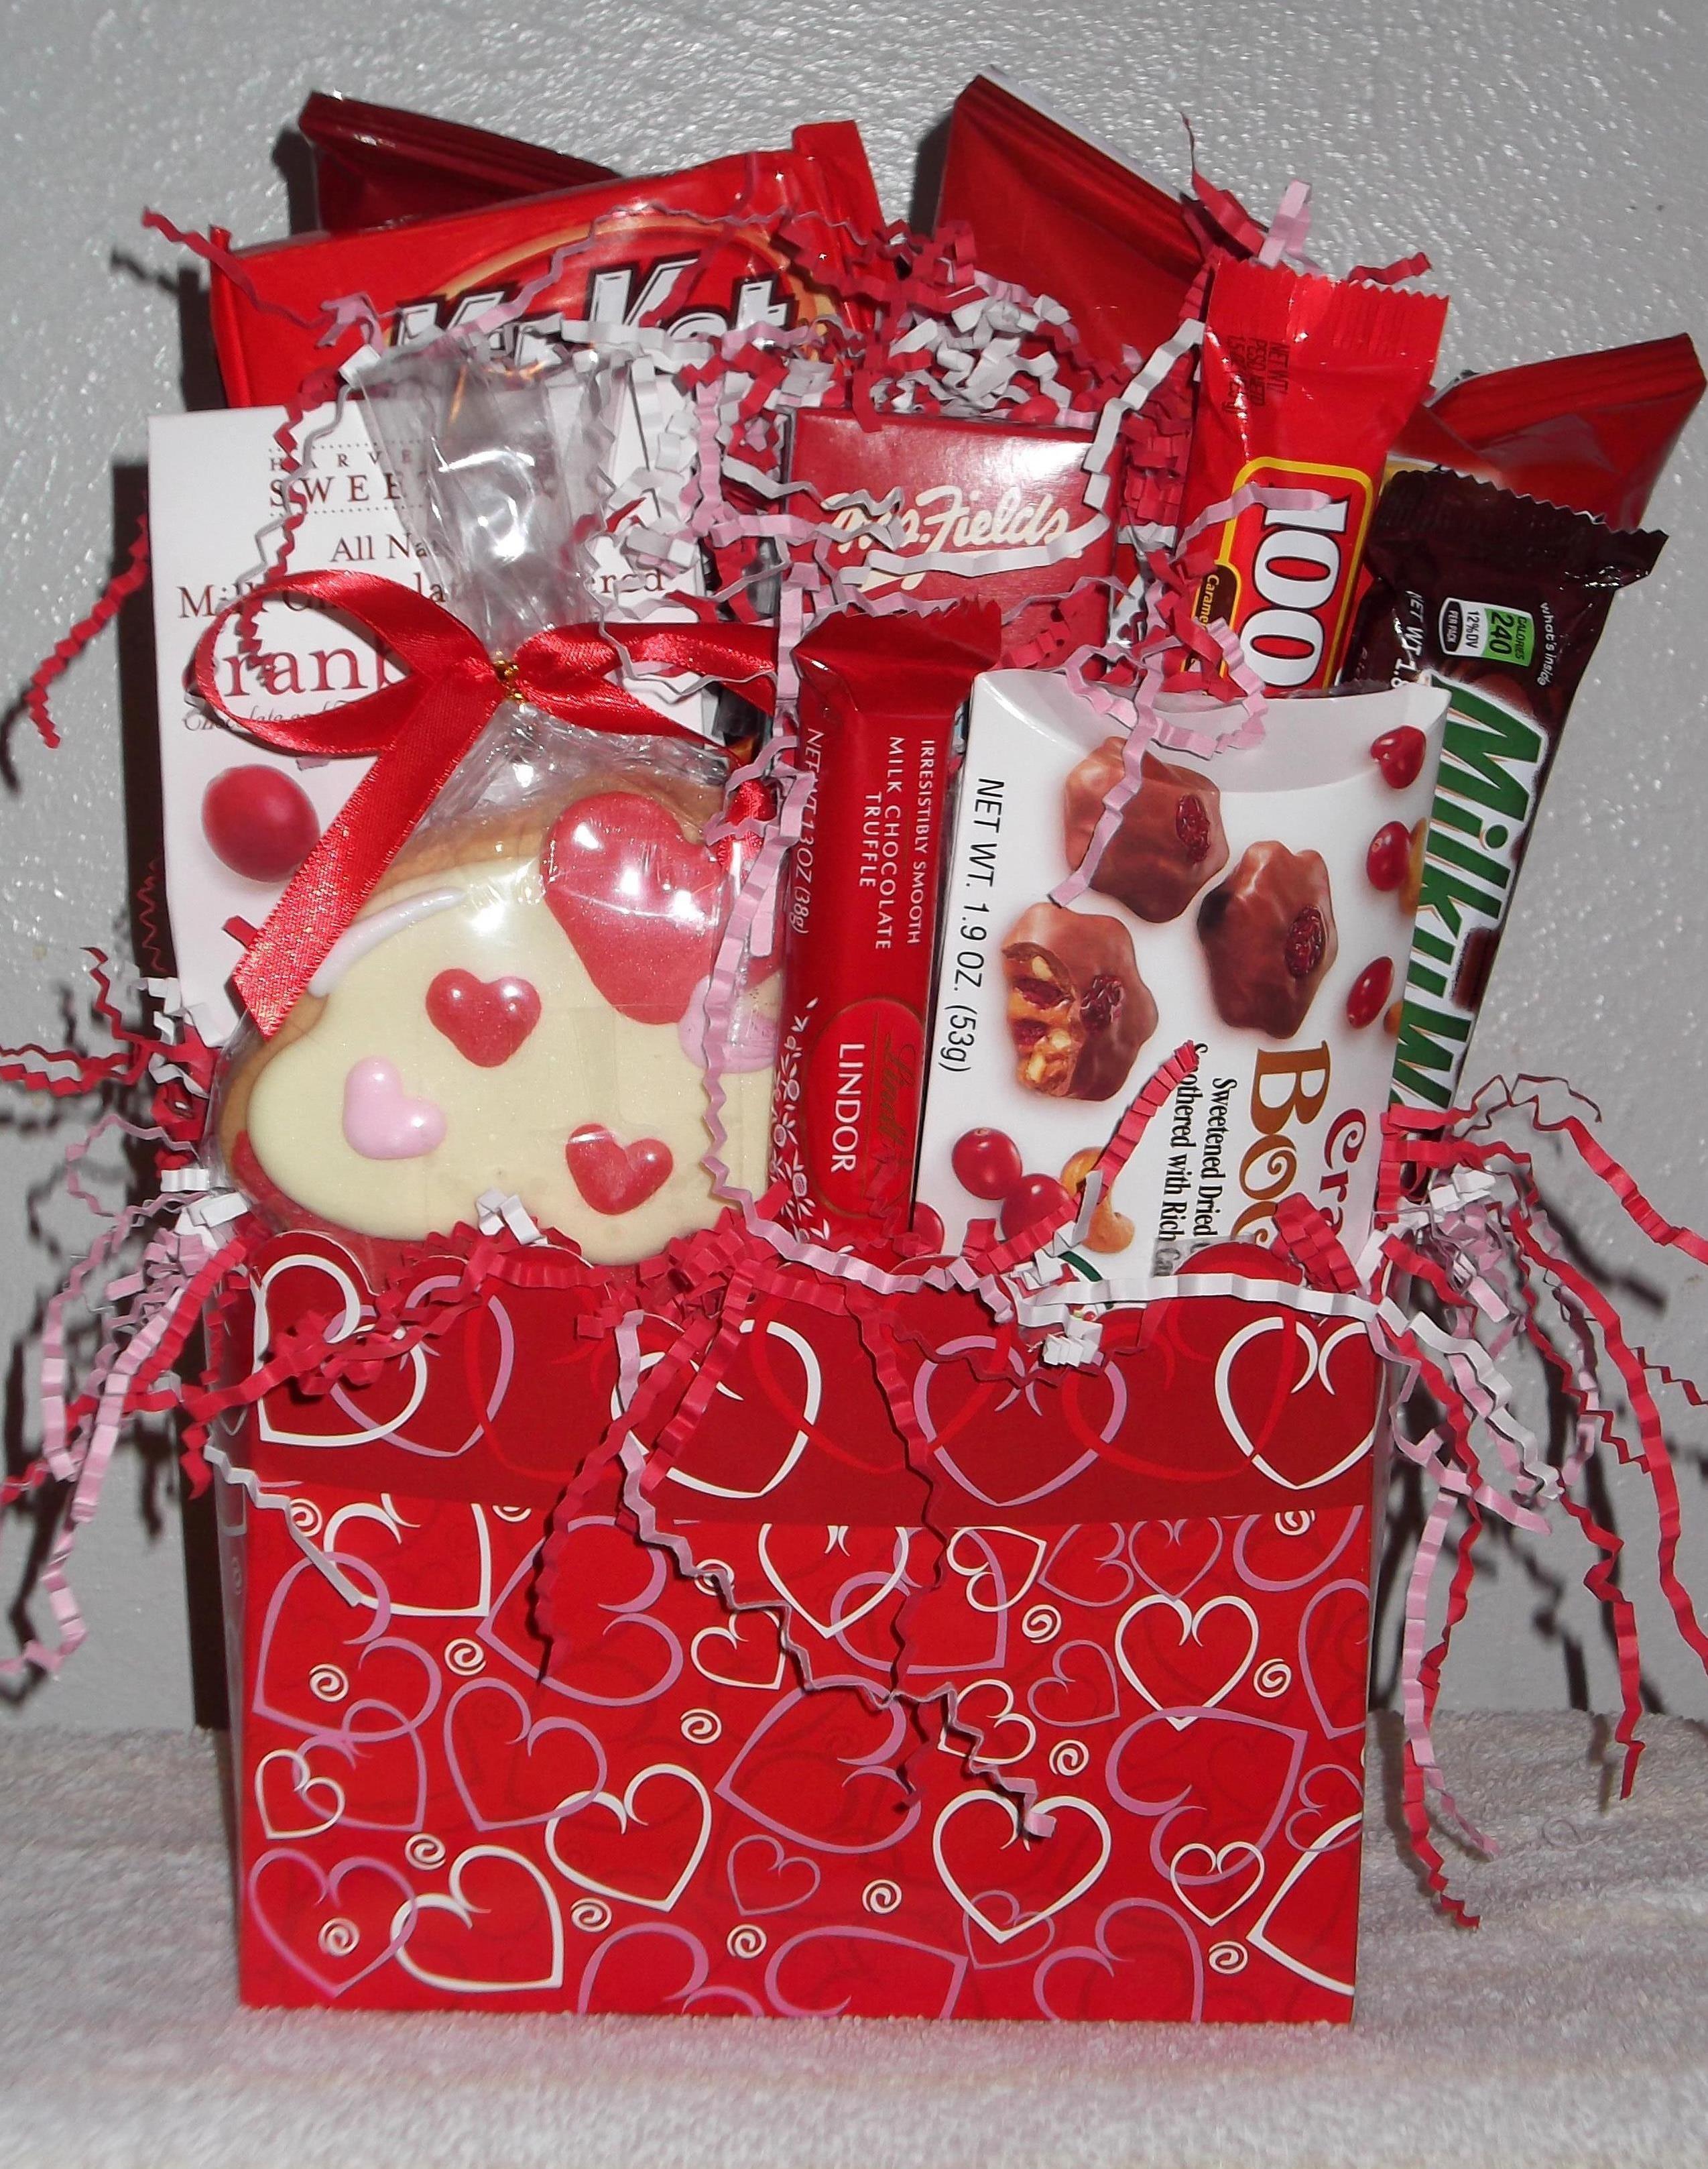 Dallas Tx Snack Gift Basket Delivery Valentine S Day